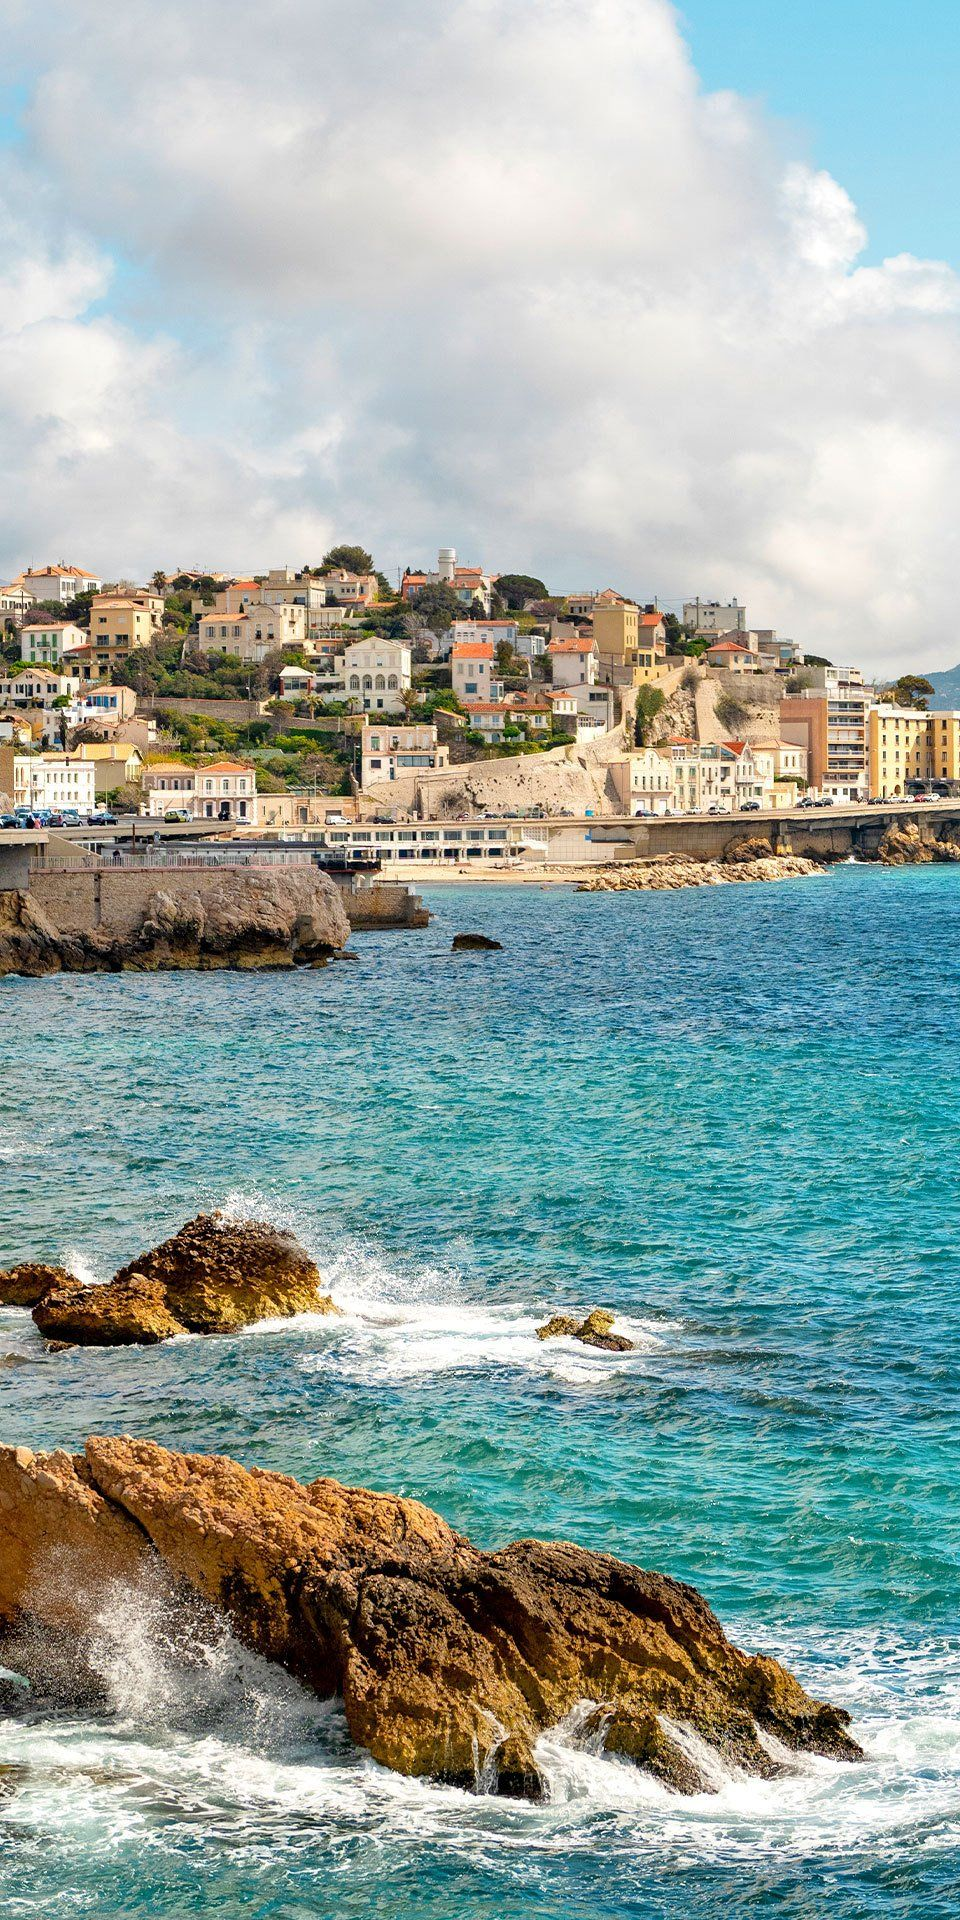 Provence, France ExploreFrance's oldest city, Marseille